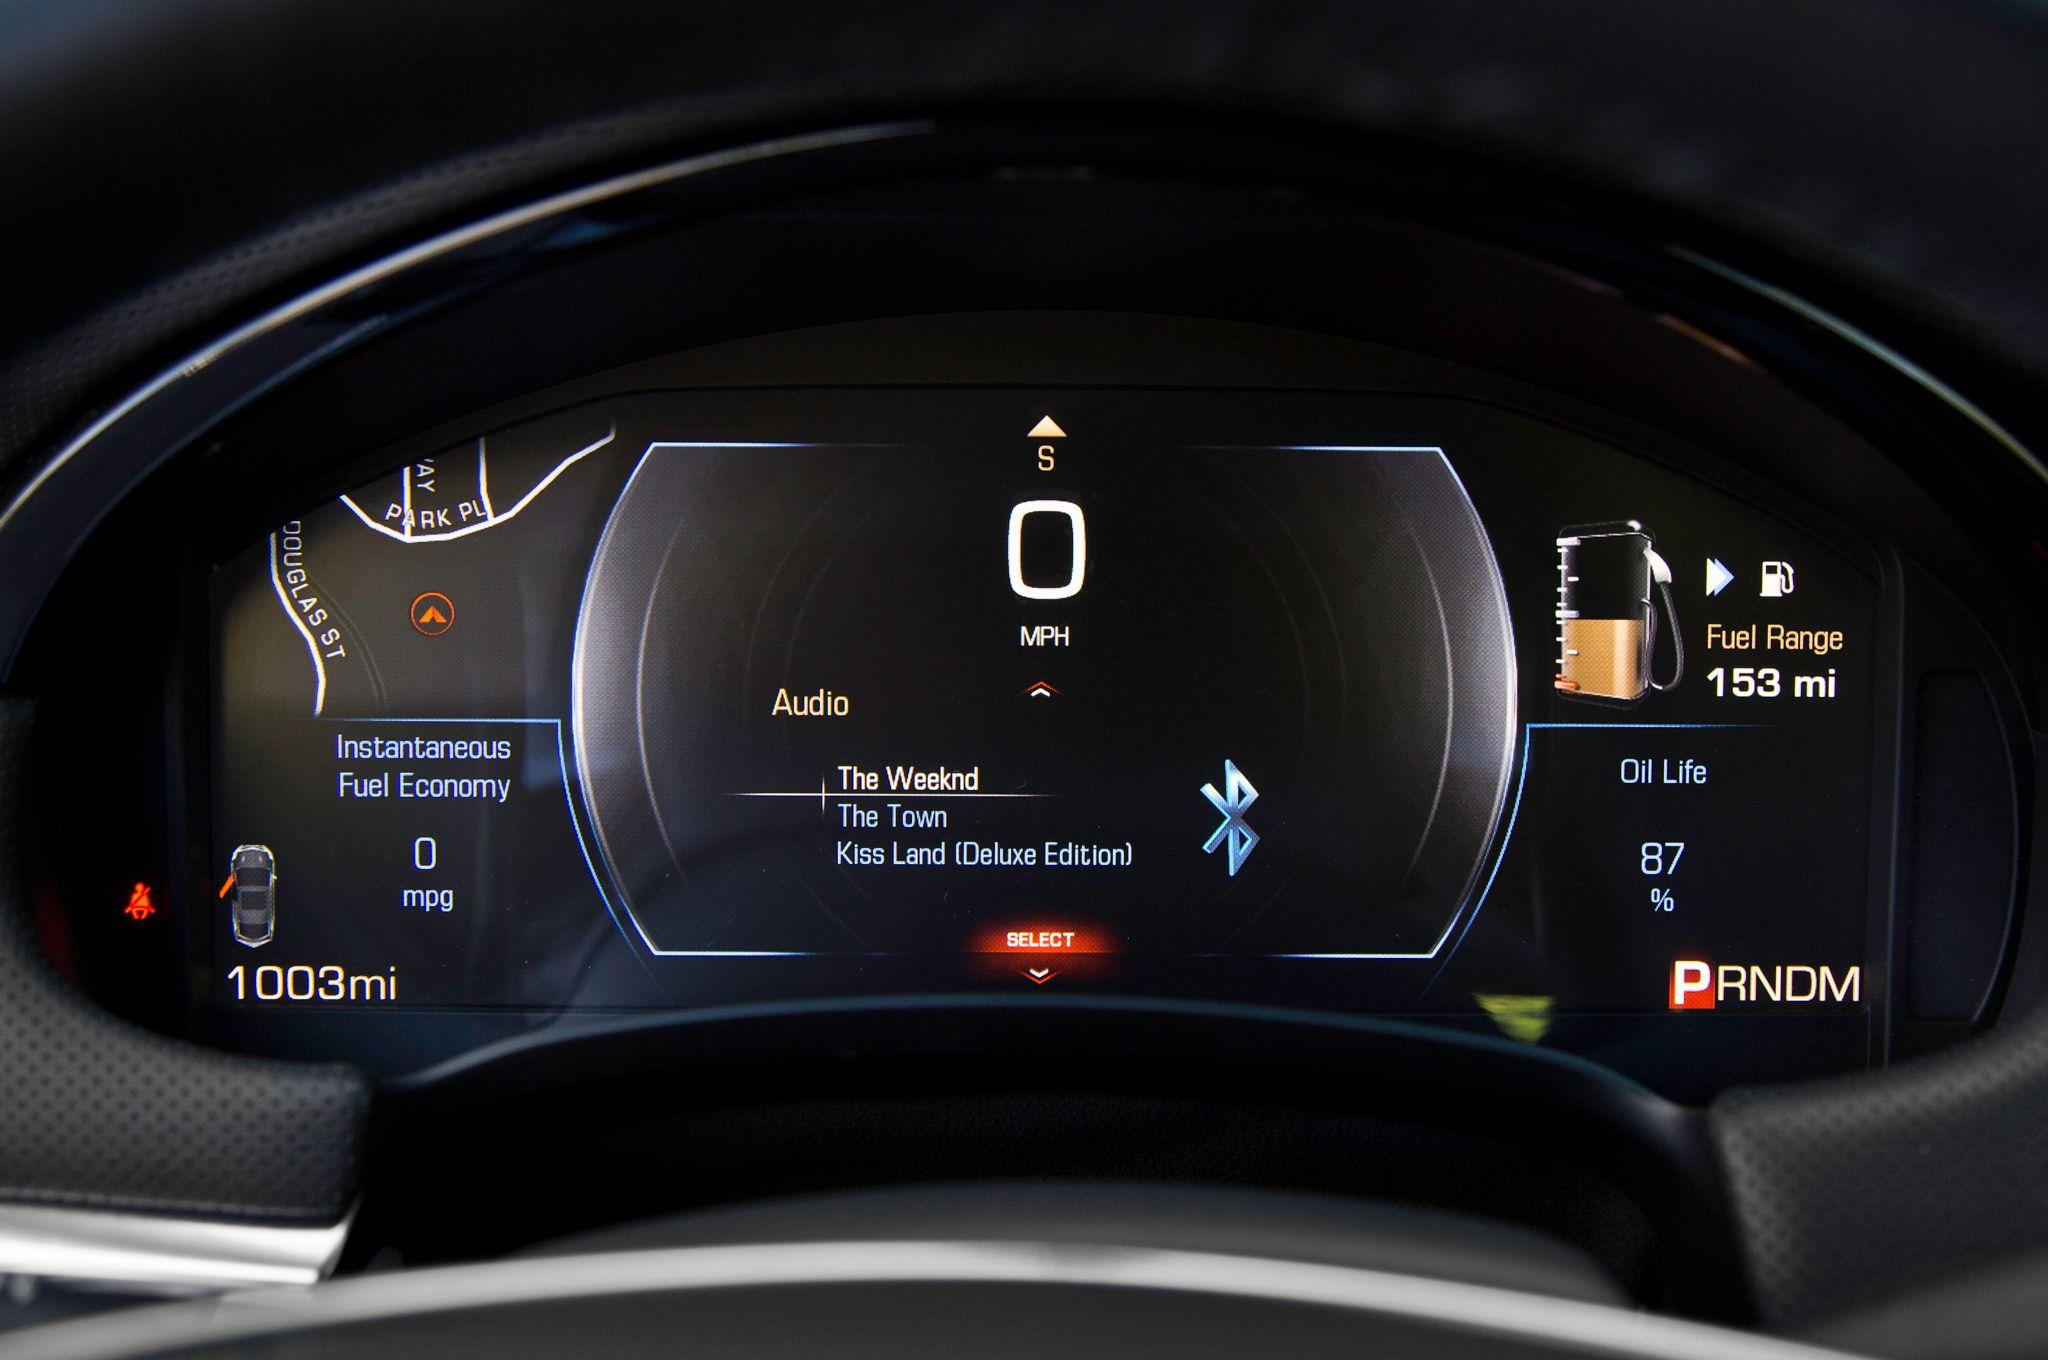 Mercedes Benz Instrument Panel